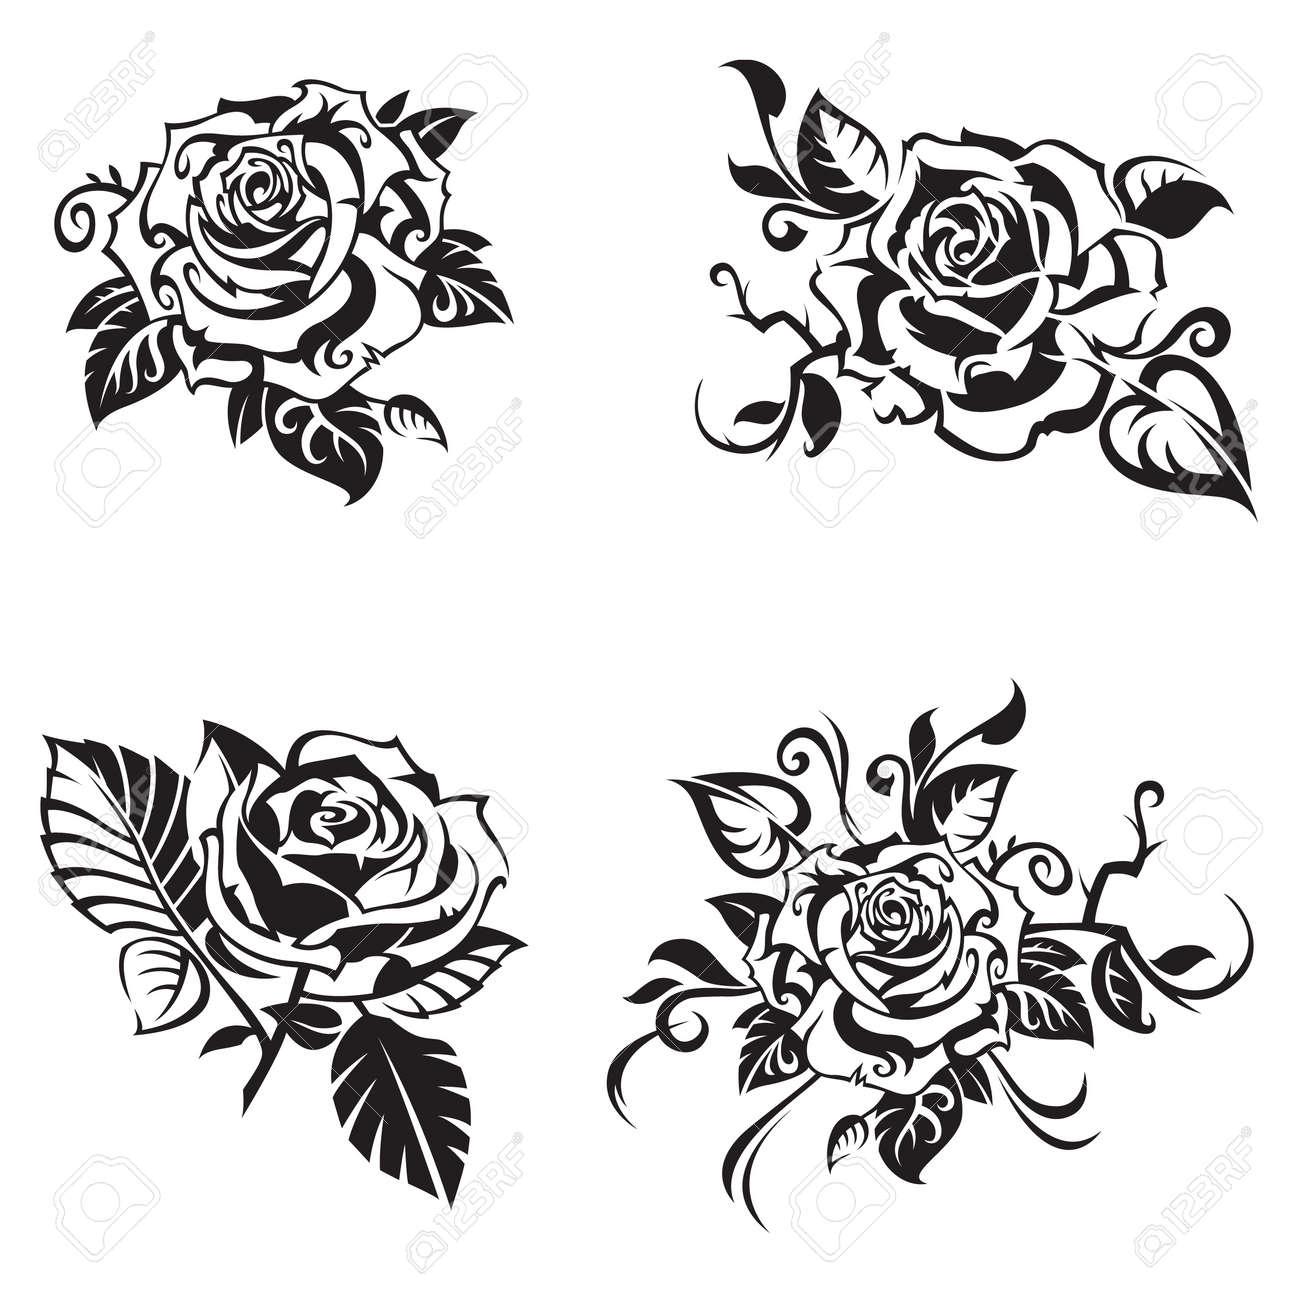 black rose set on white background - 53233614